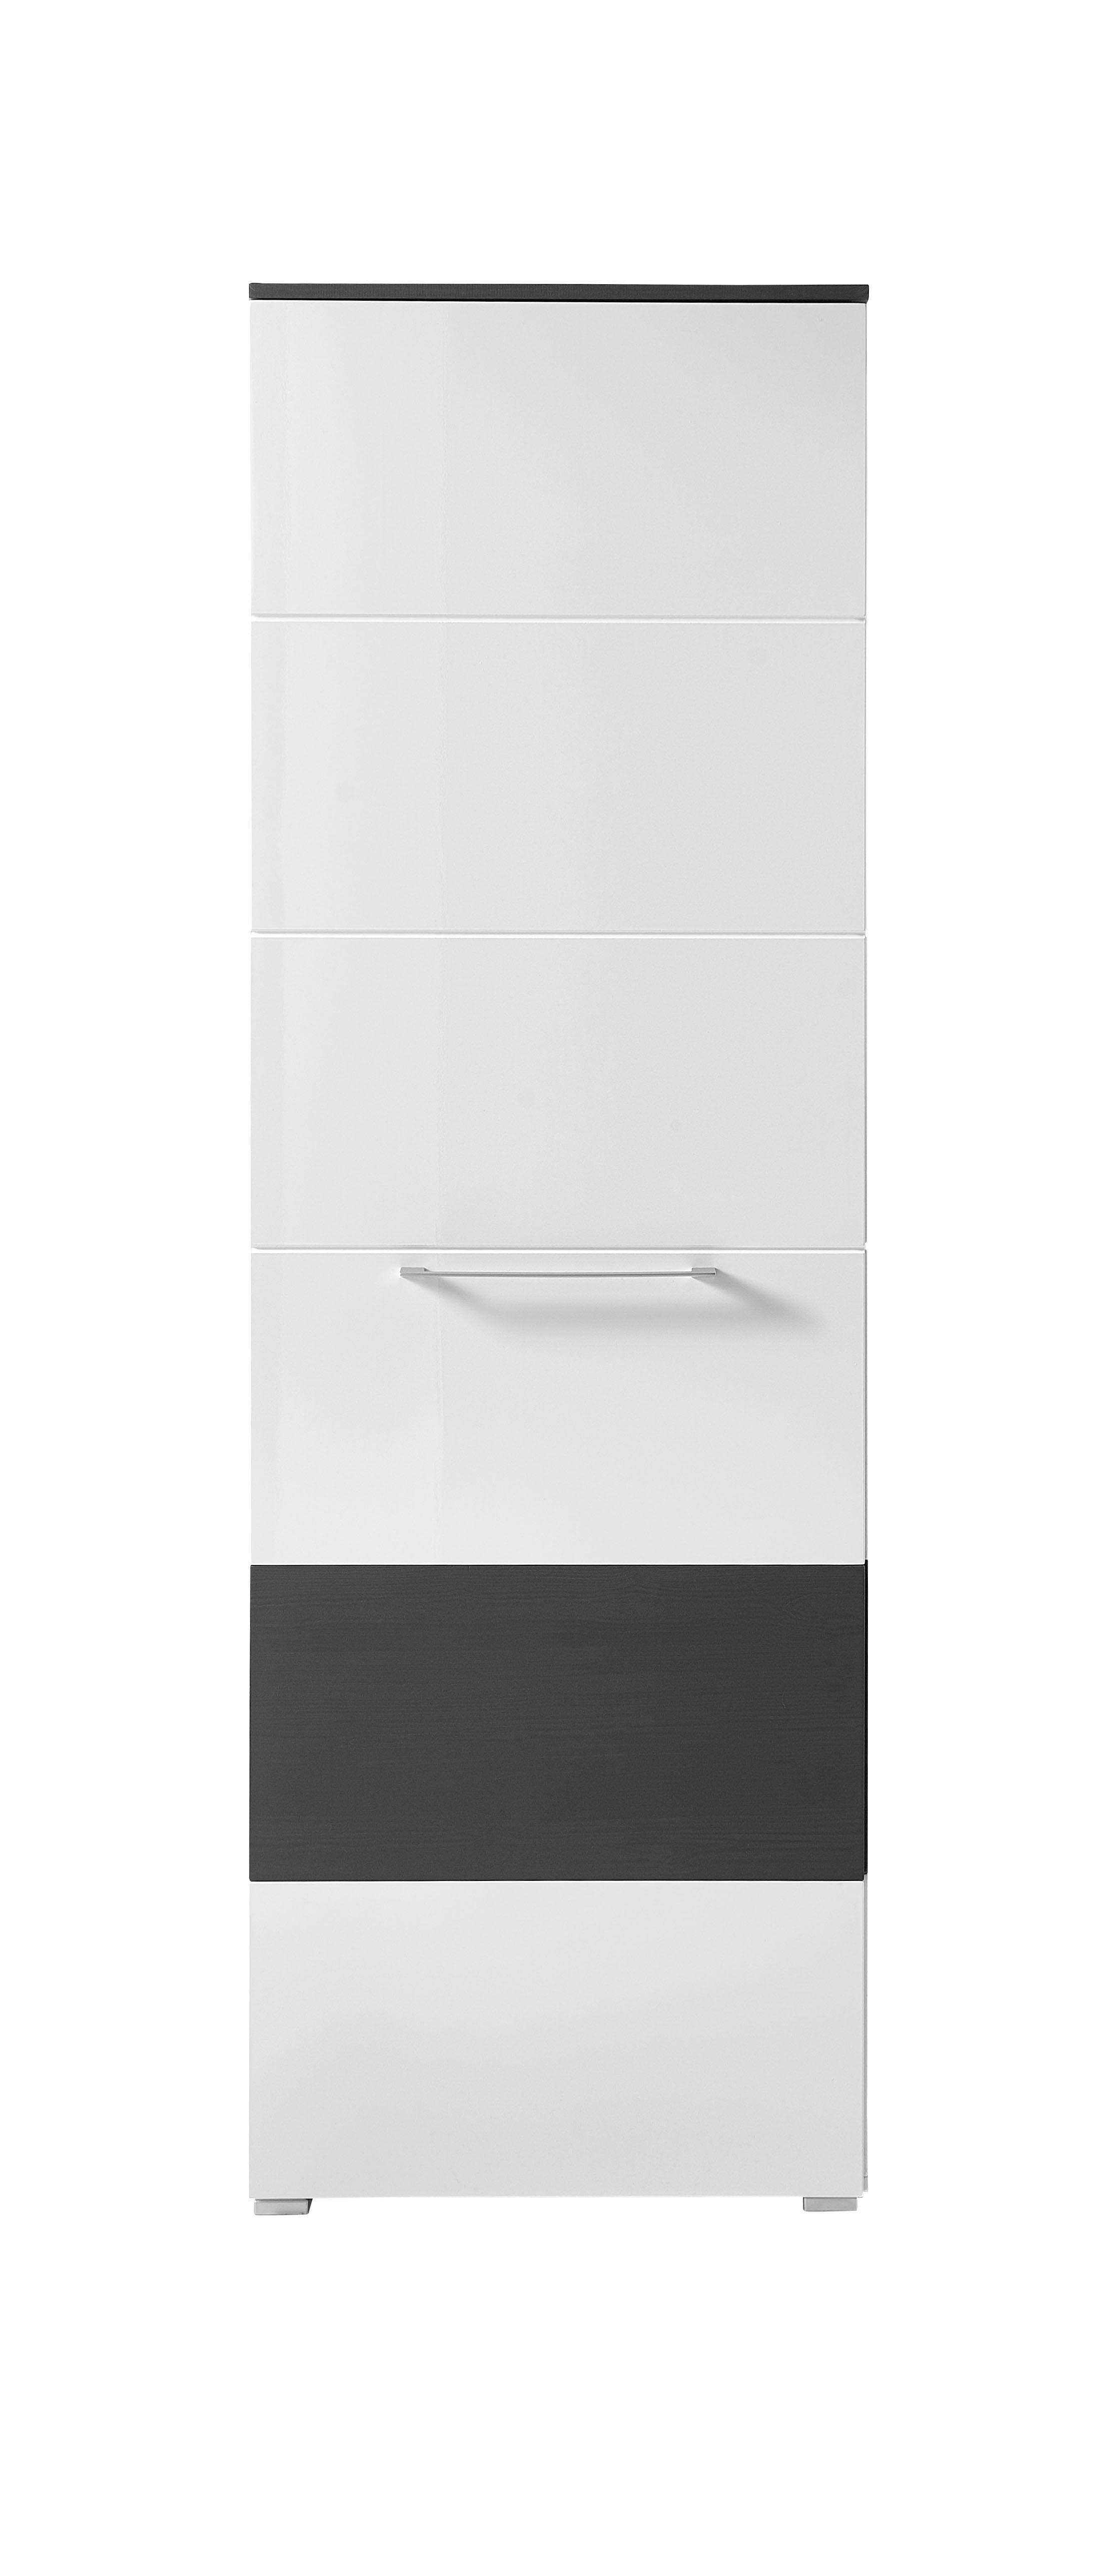 garderobe reno 5 tlg hochschrank paneel spiegel. Black Bedroom Furniture Sets. Home Design Ideas